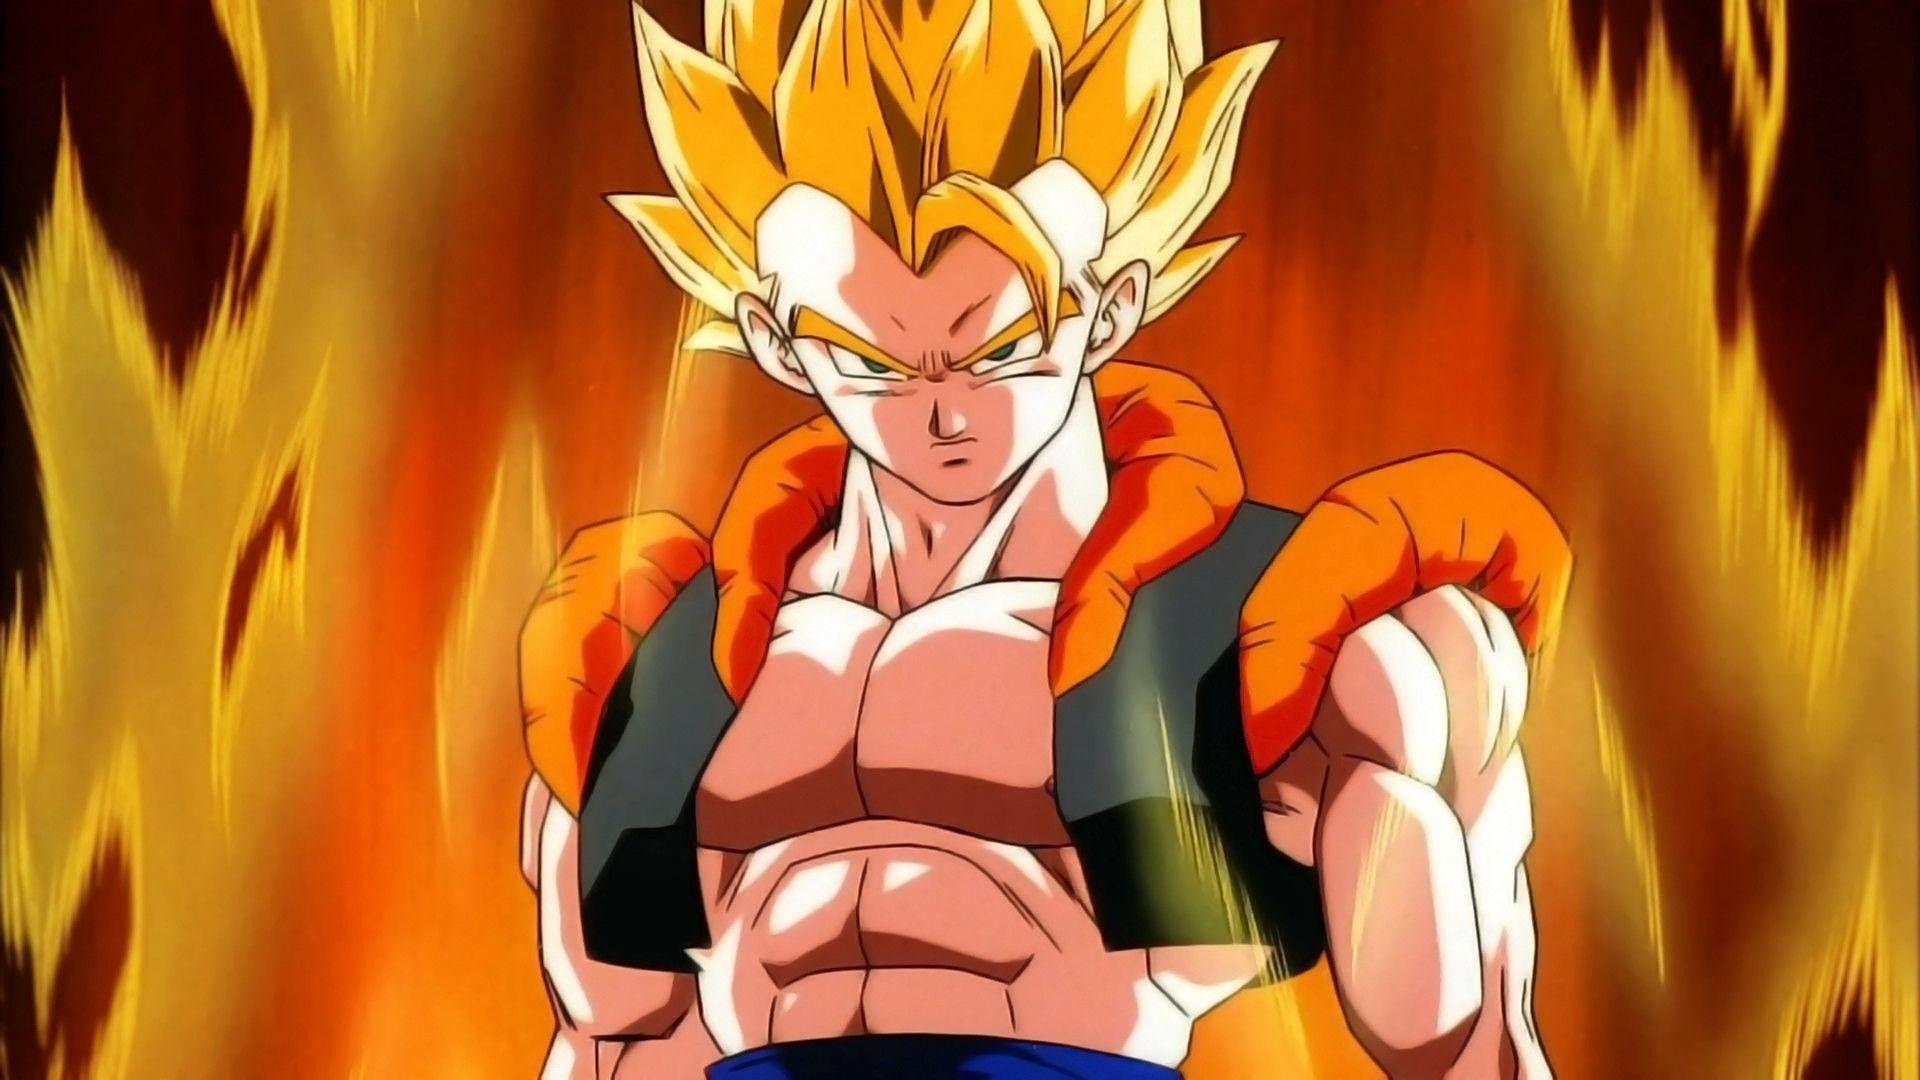 Pin by Raul on Dragon ball super Dragon ball z, Anime